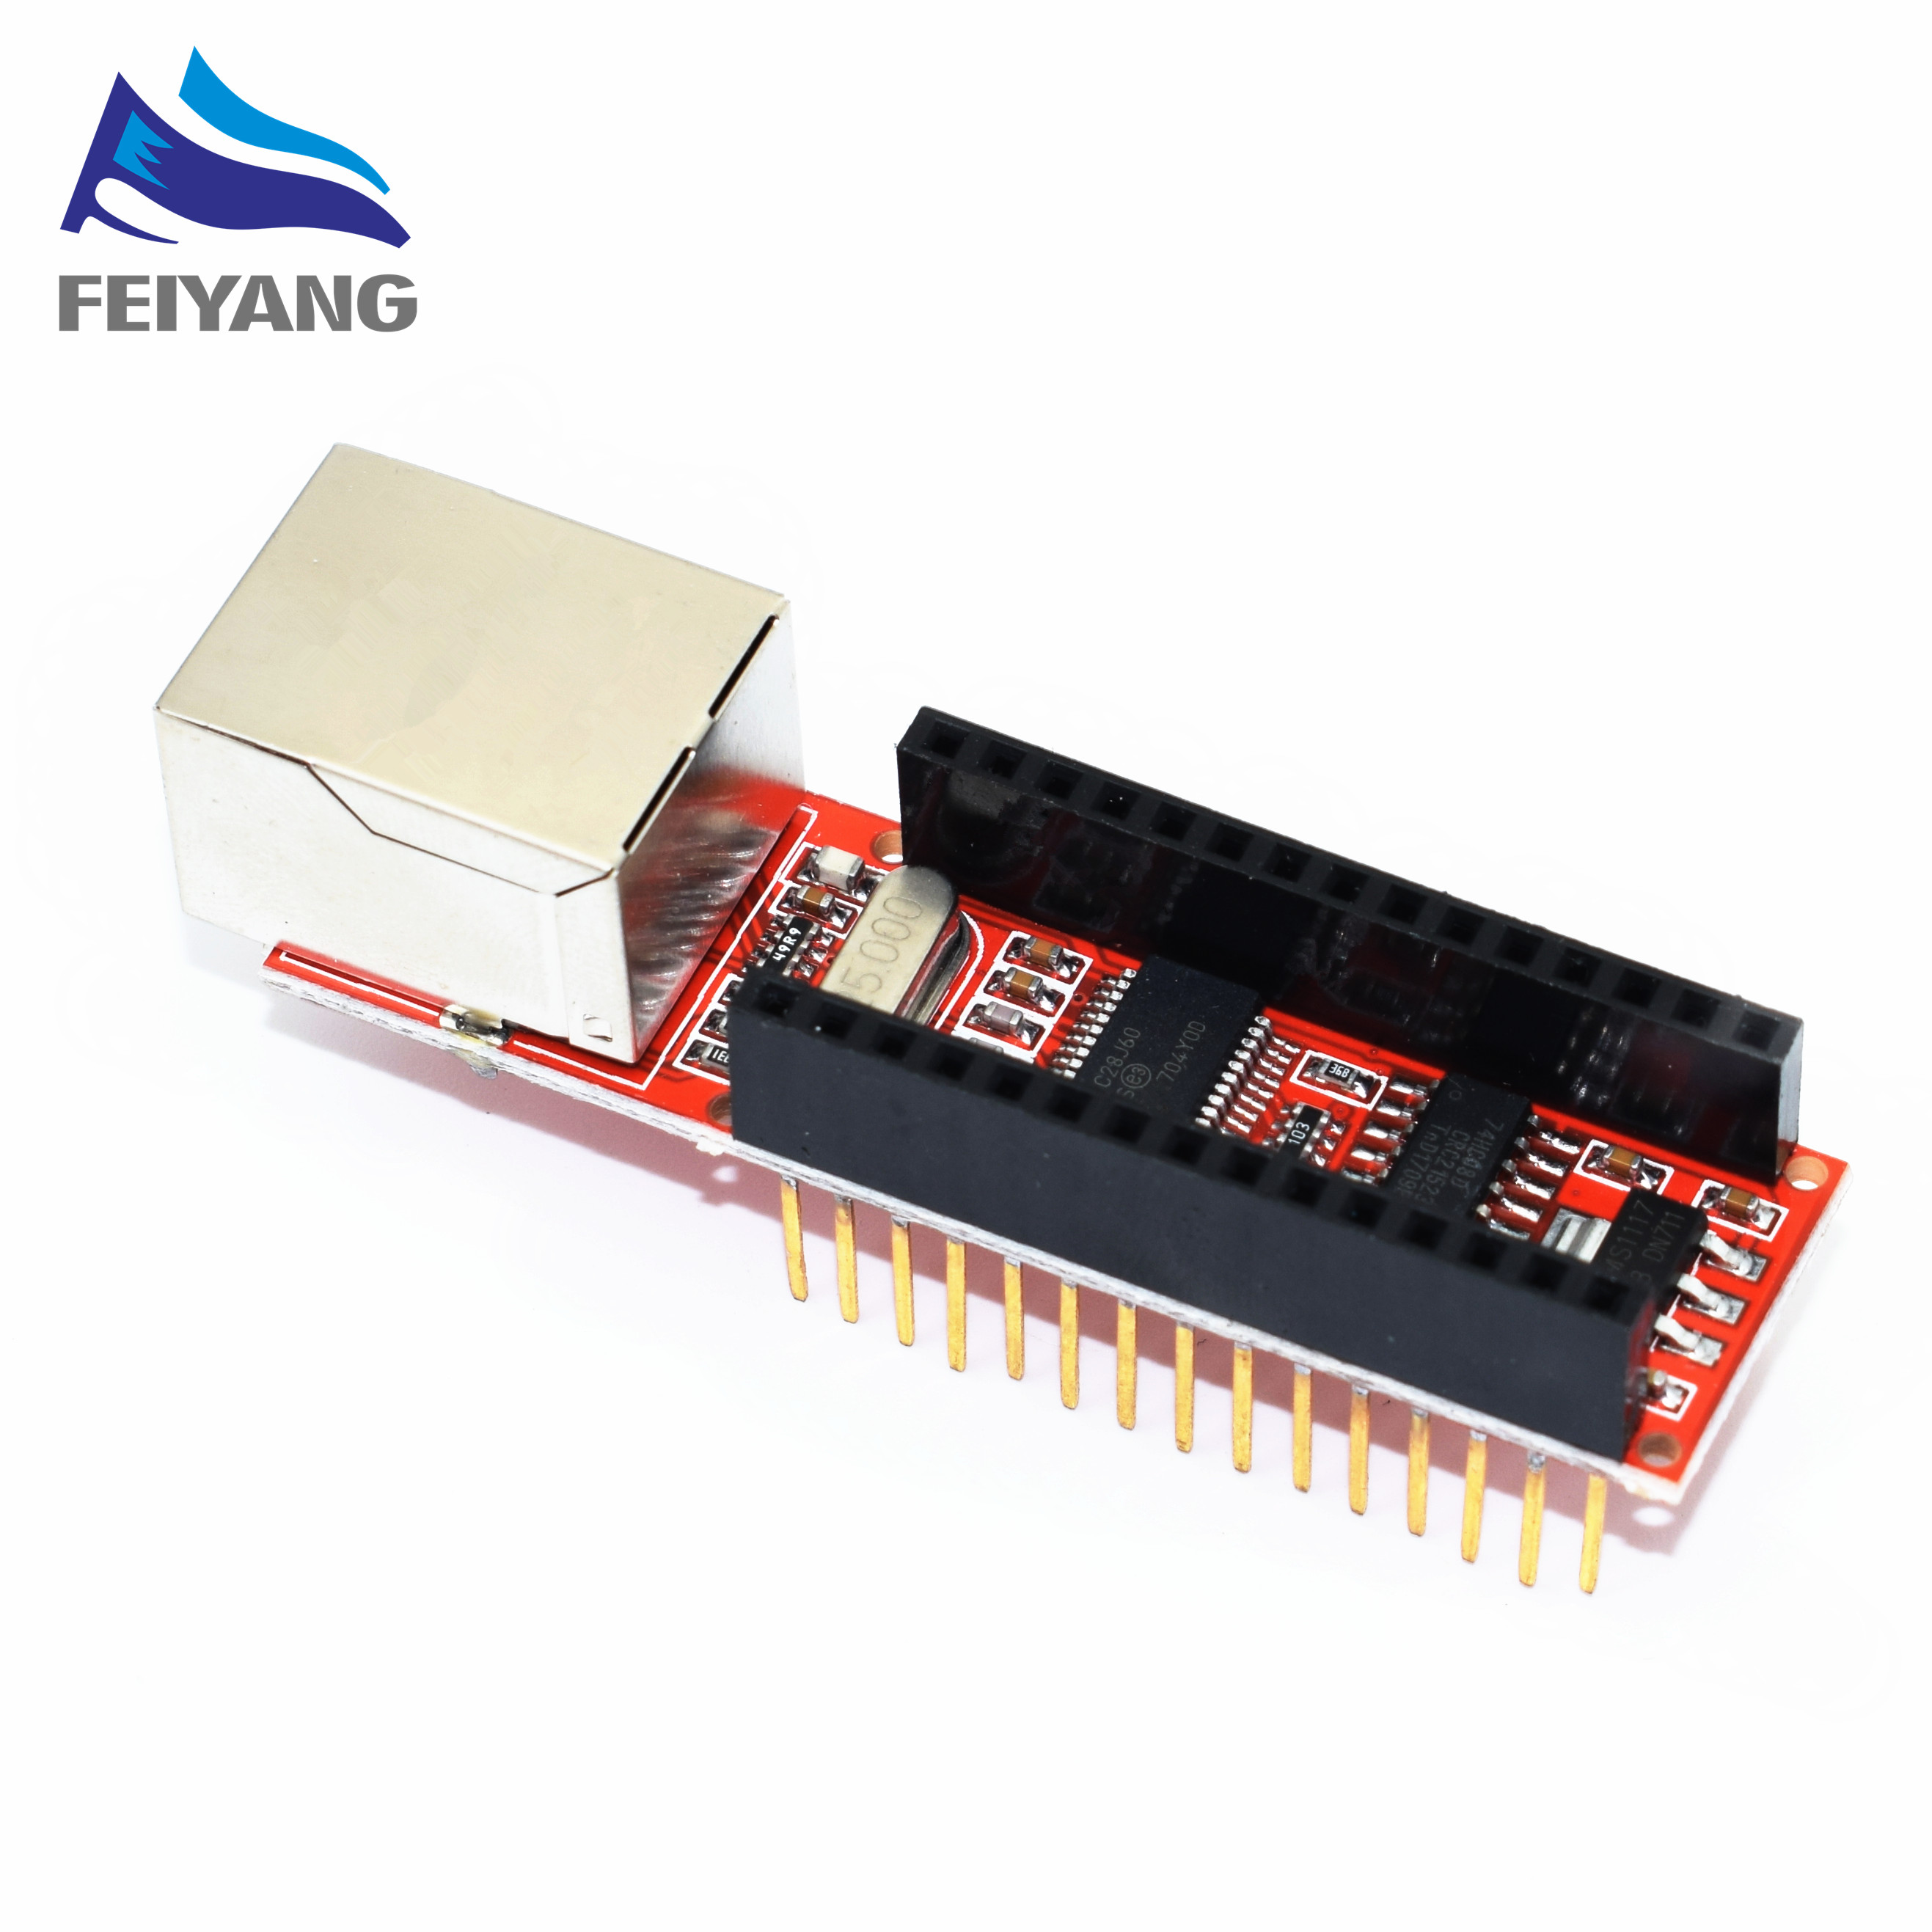 1 pz ENC28J60 Ethernet Shield V1.0 Nano 3.0 RJ45 Modulo Webserver (hong)1 pz ENC28J60 Ethernet Shield V1.0 Nano 3.0 RJ45 Modulo Webserver (hong)